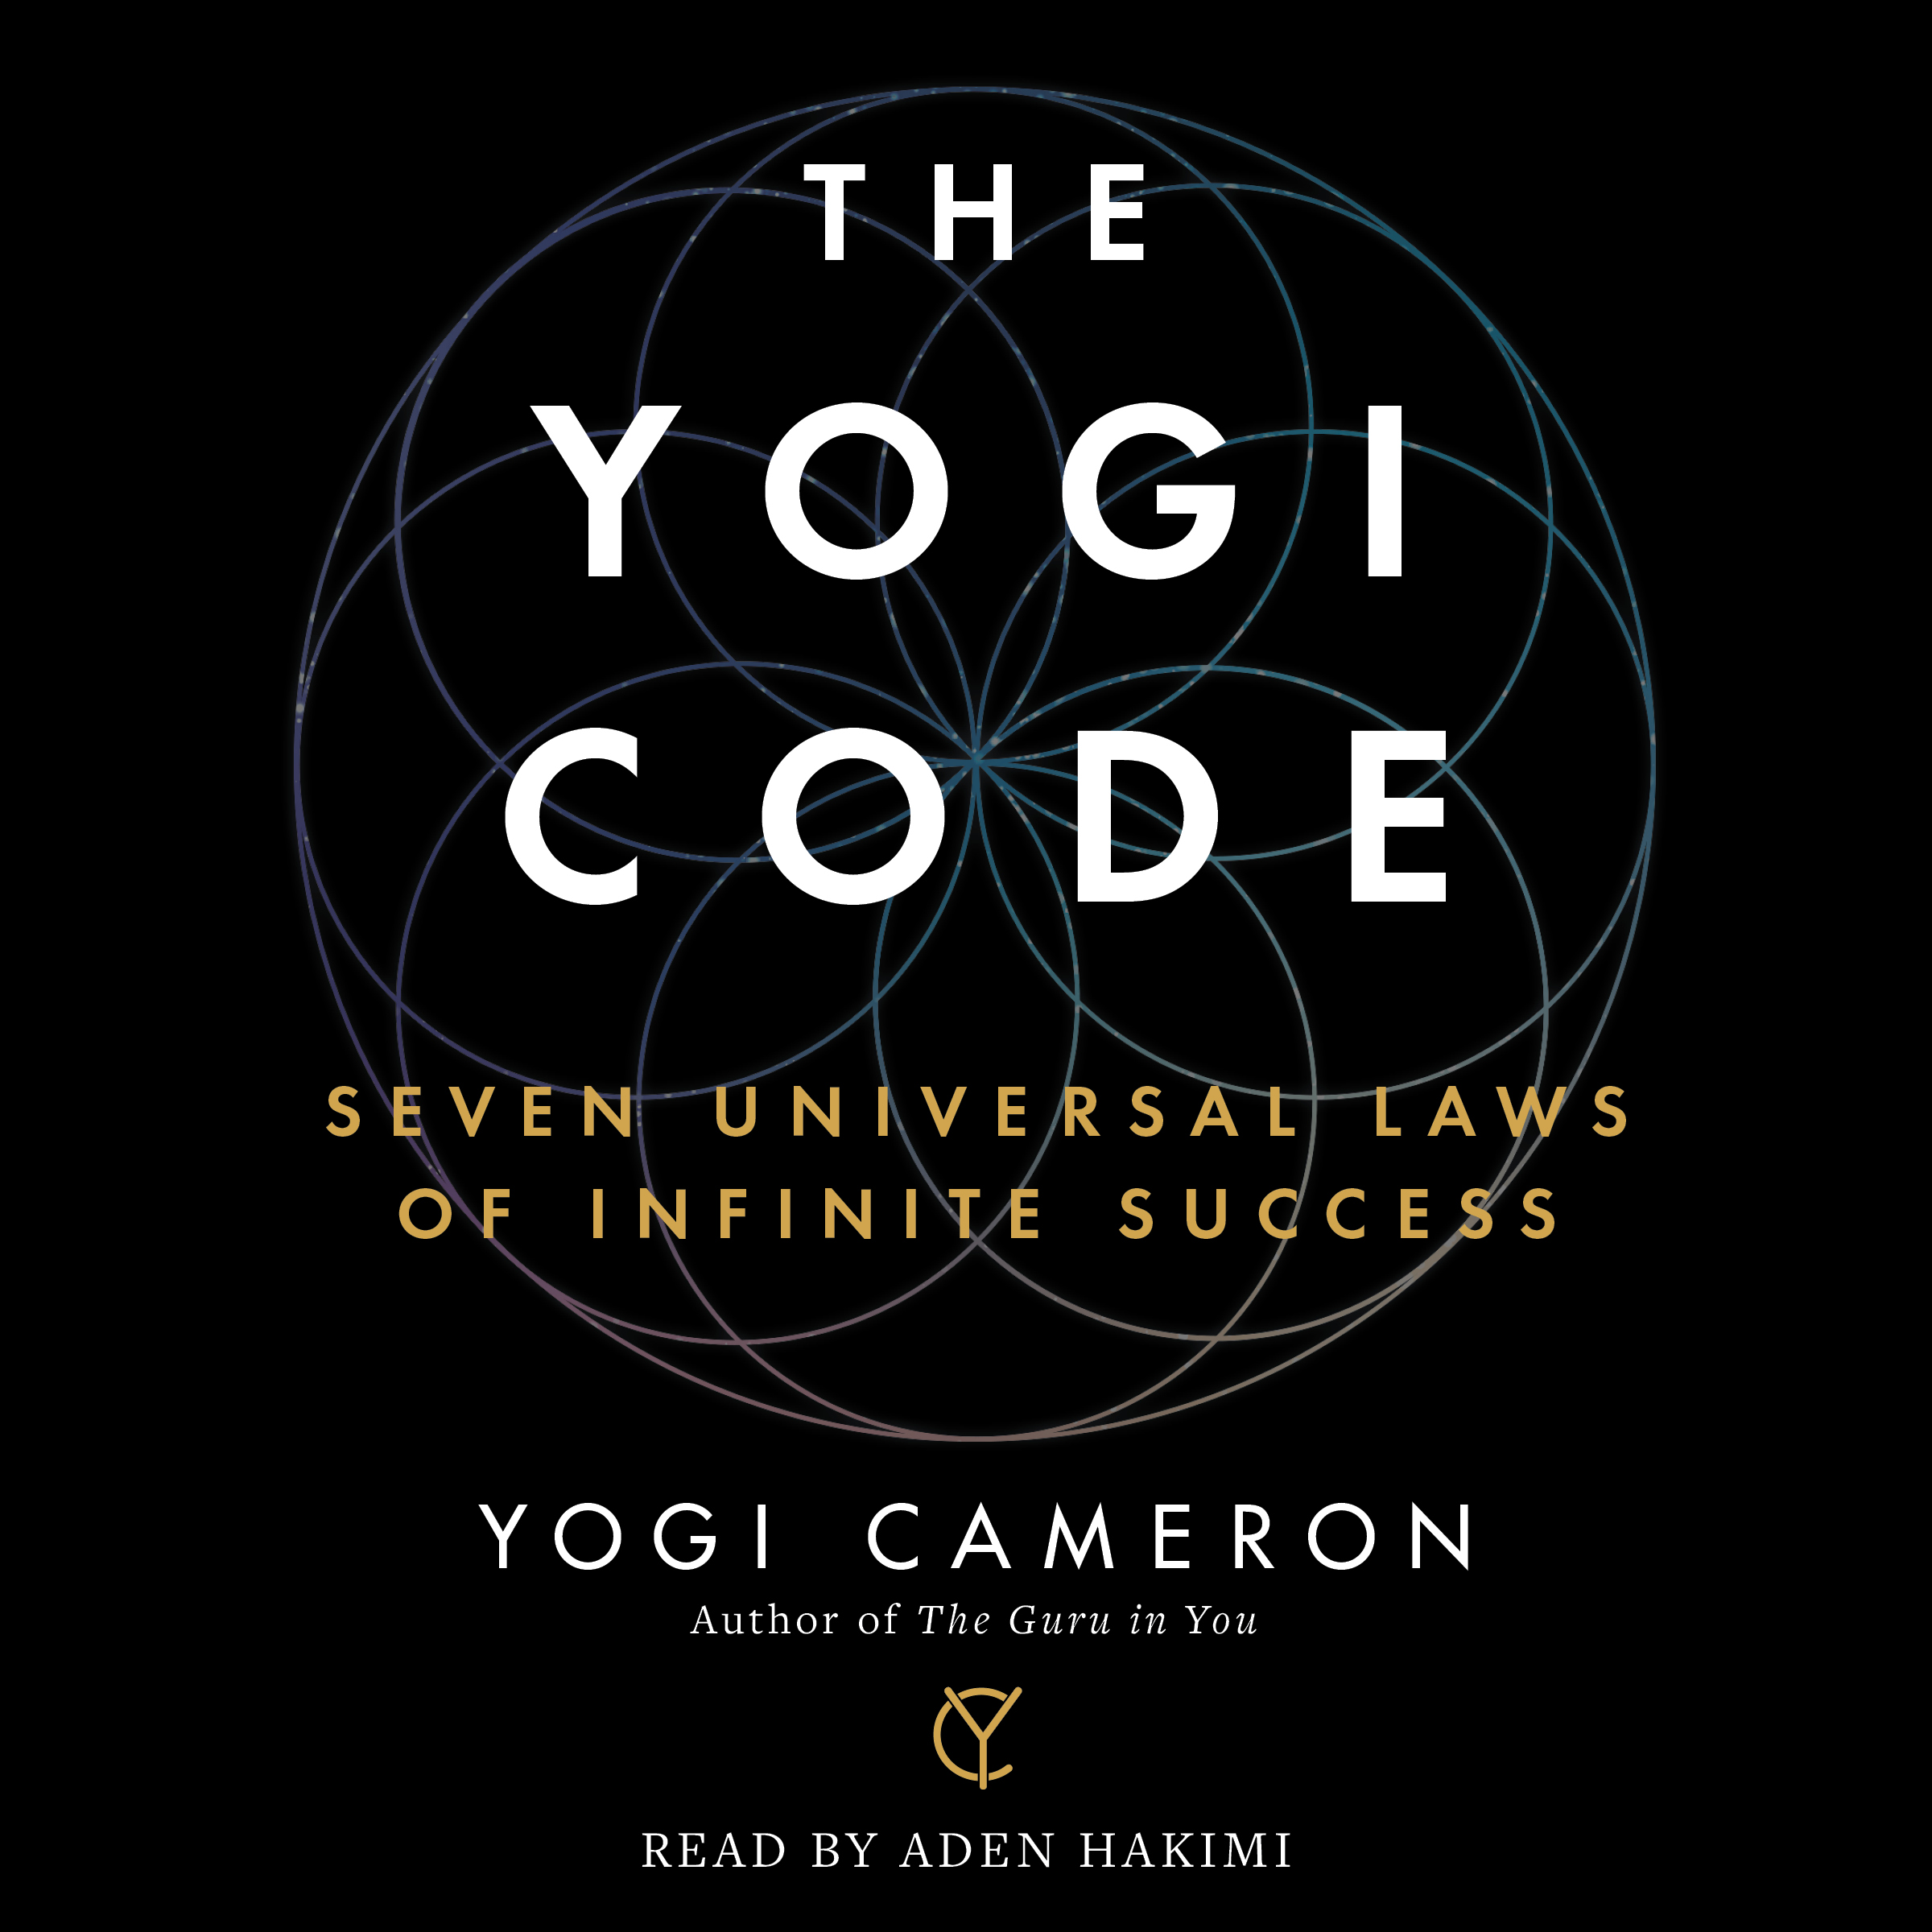 Book Cover Image (jpg): The Yogi Code. Unabridged Audio Download  9781508241096